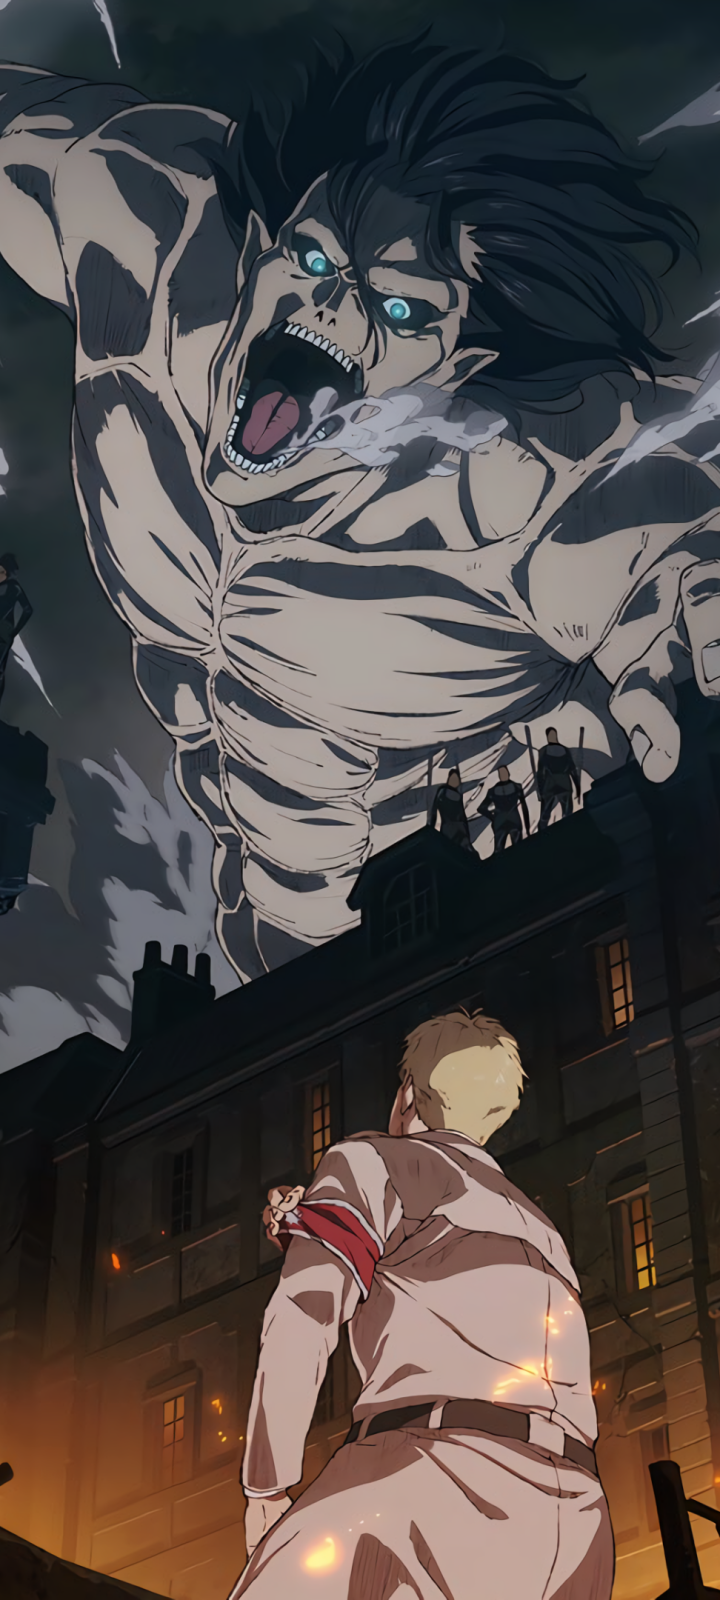 Download Eren Jaeger Shingeki Kyojin Titan Attack On No